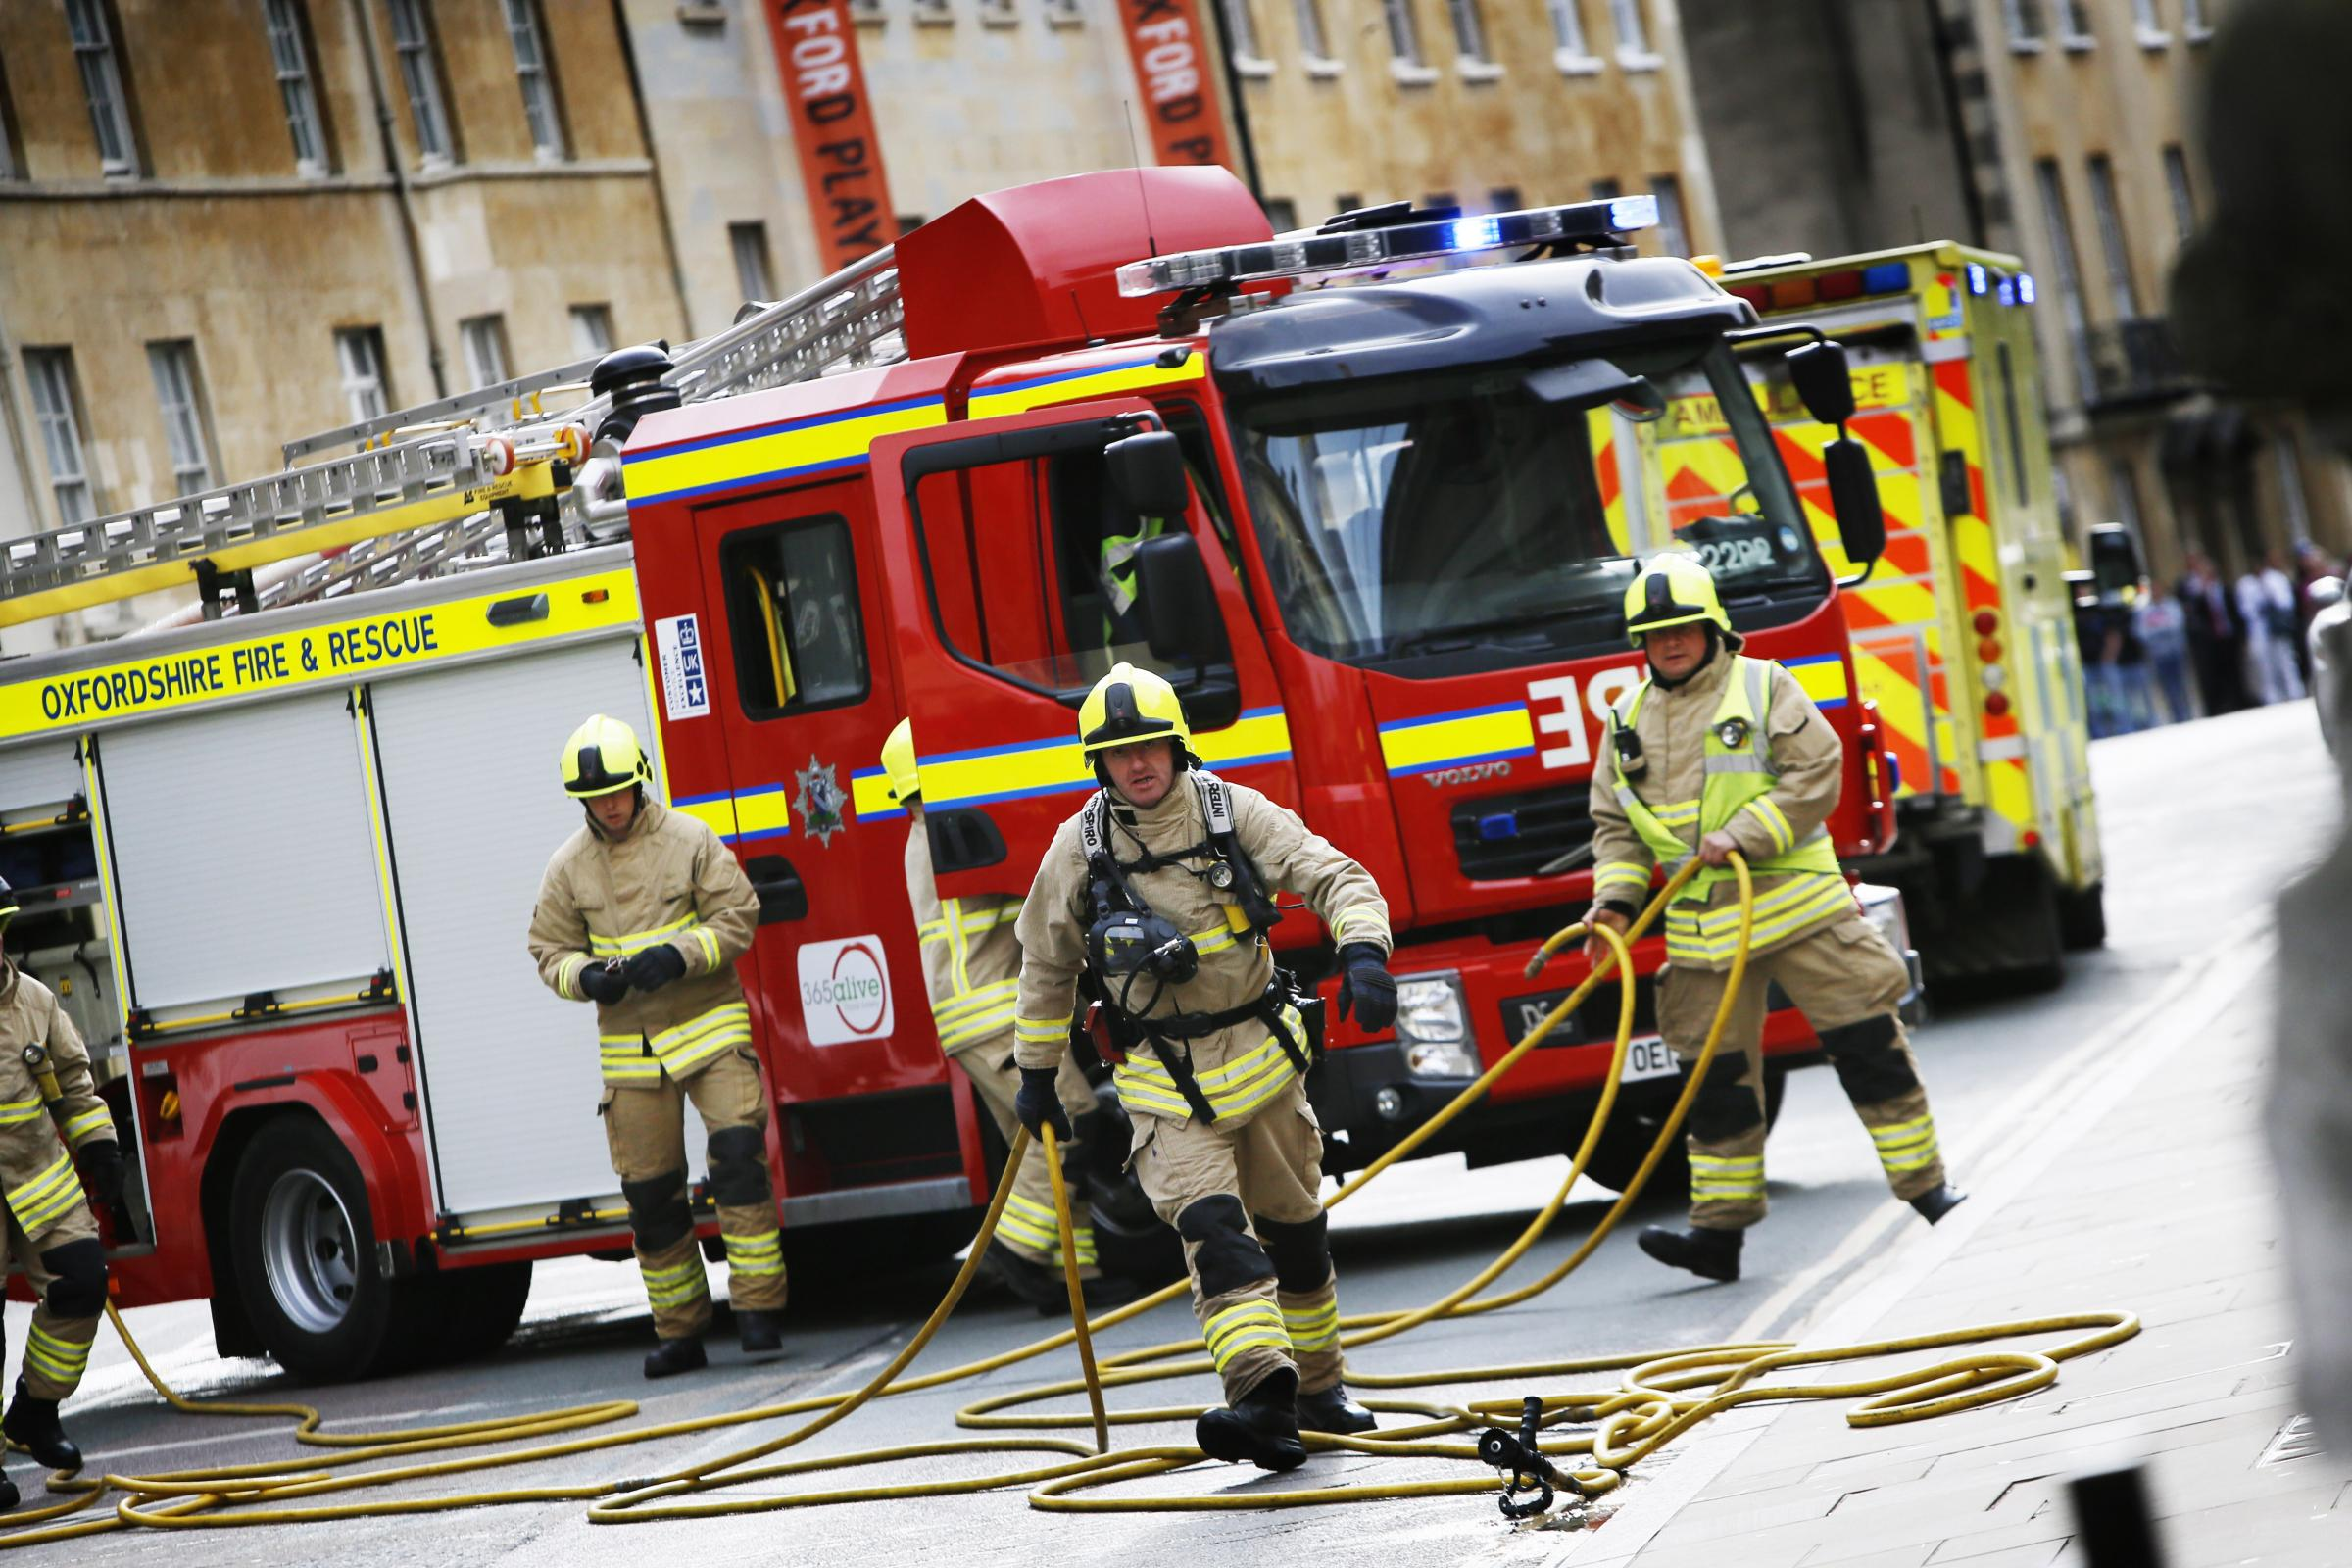 Update Fire Crews Praised After Tackling Blaze At Mondelez